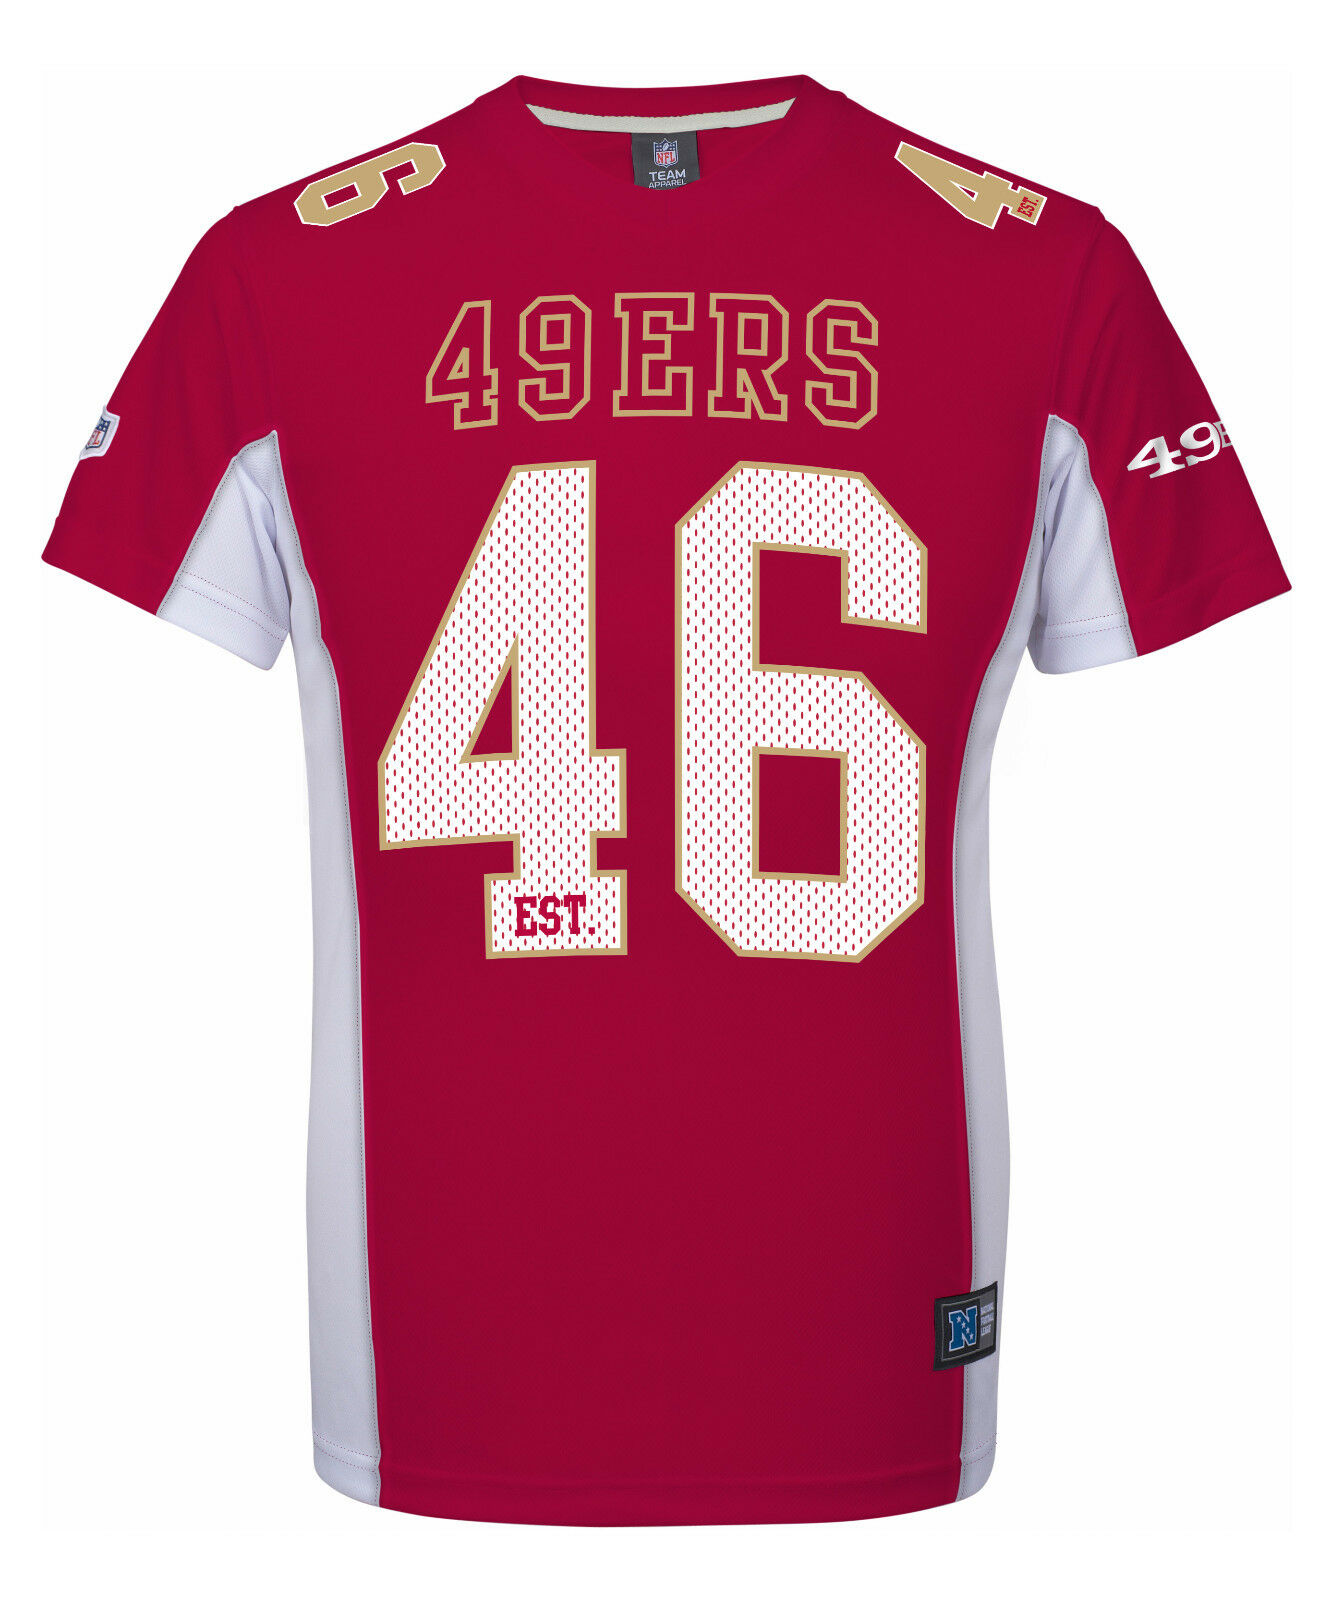 NFL Football Trikot Jersey Shirt SAN FRANCISCO 49ERS 46 rot est.MGold Majestic